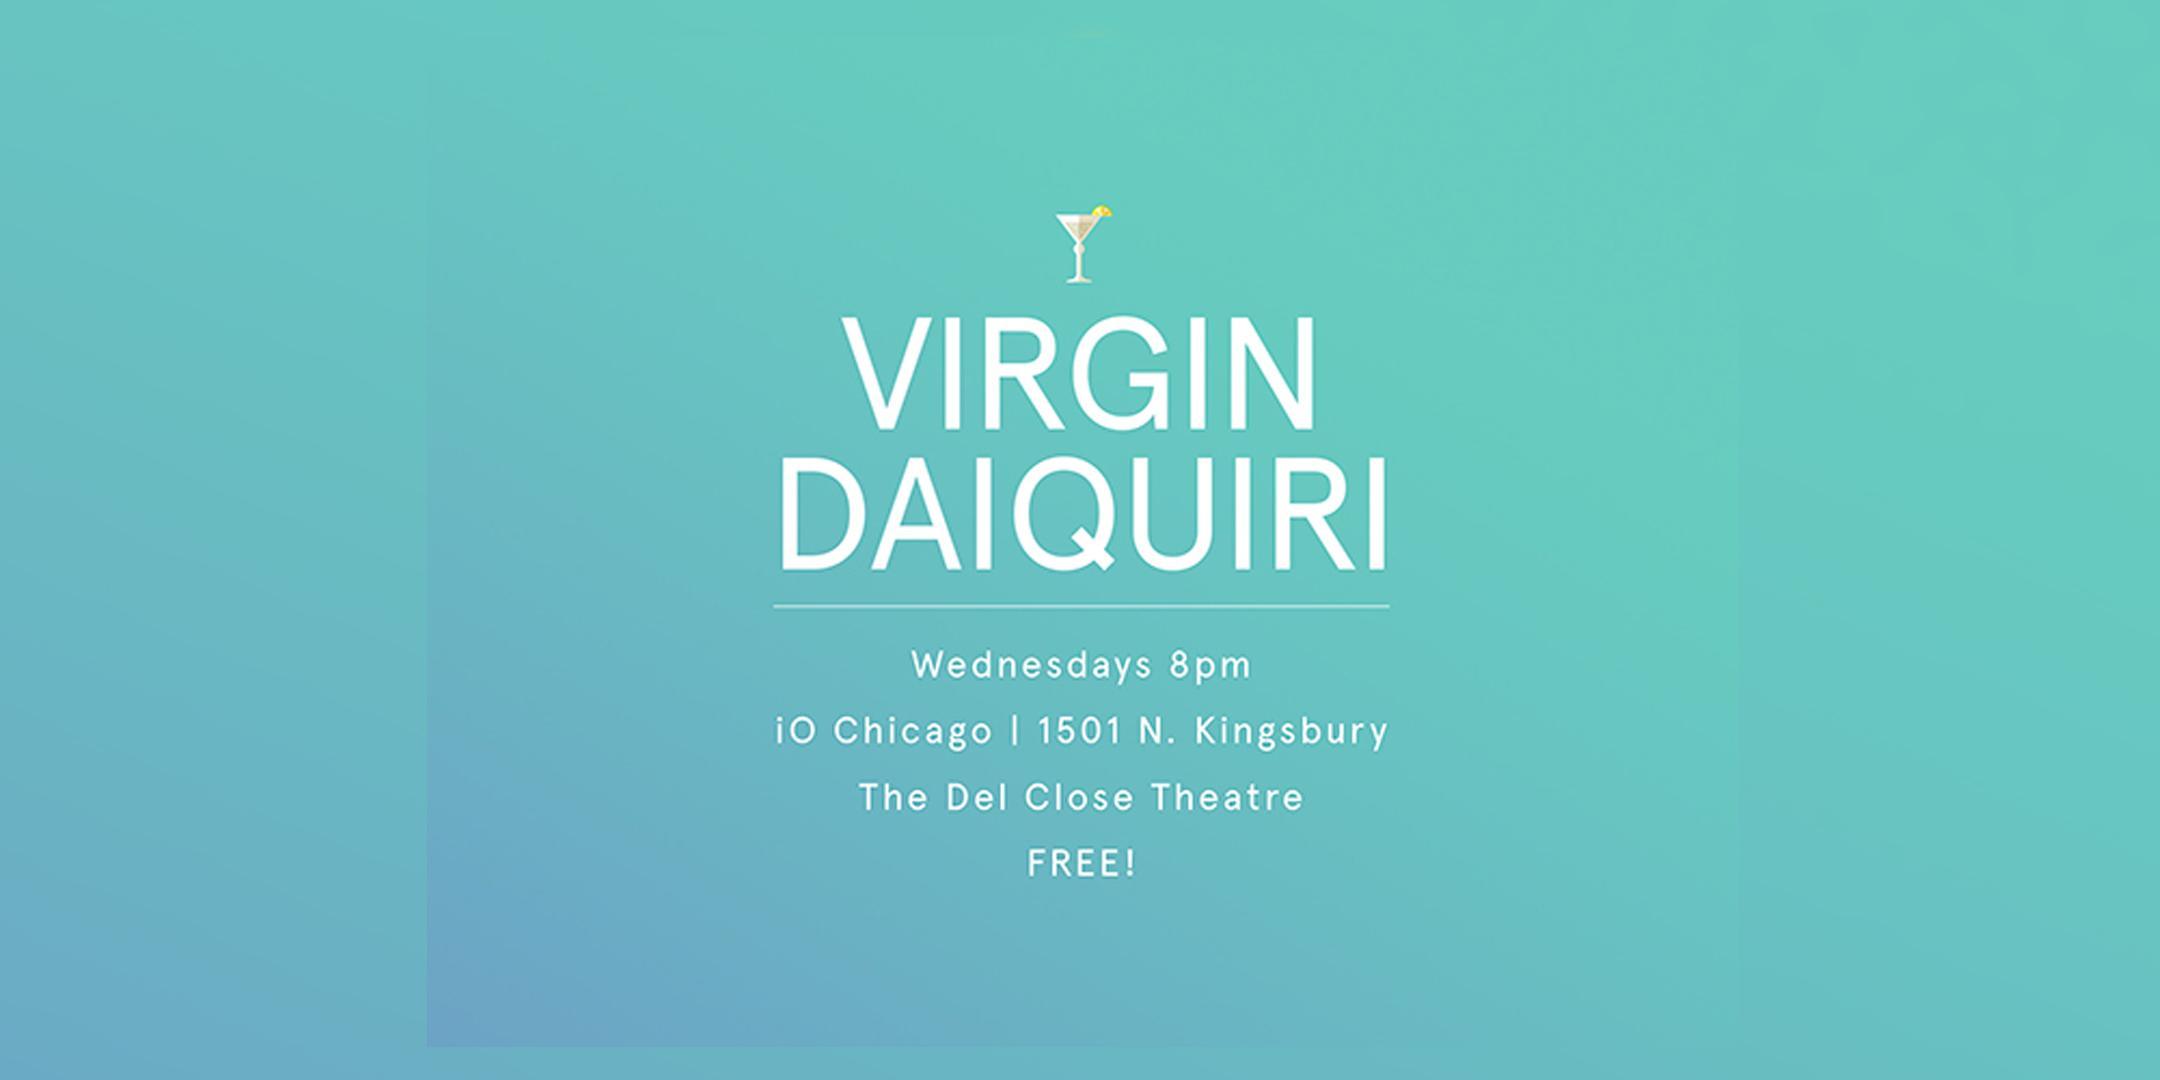 Virgin Daiquiri, The Harold Team MacBeth